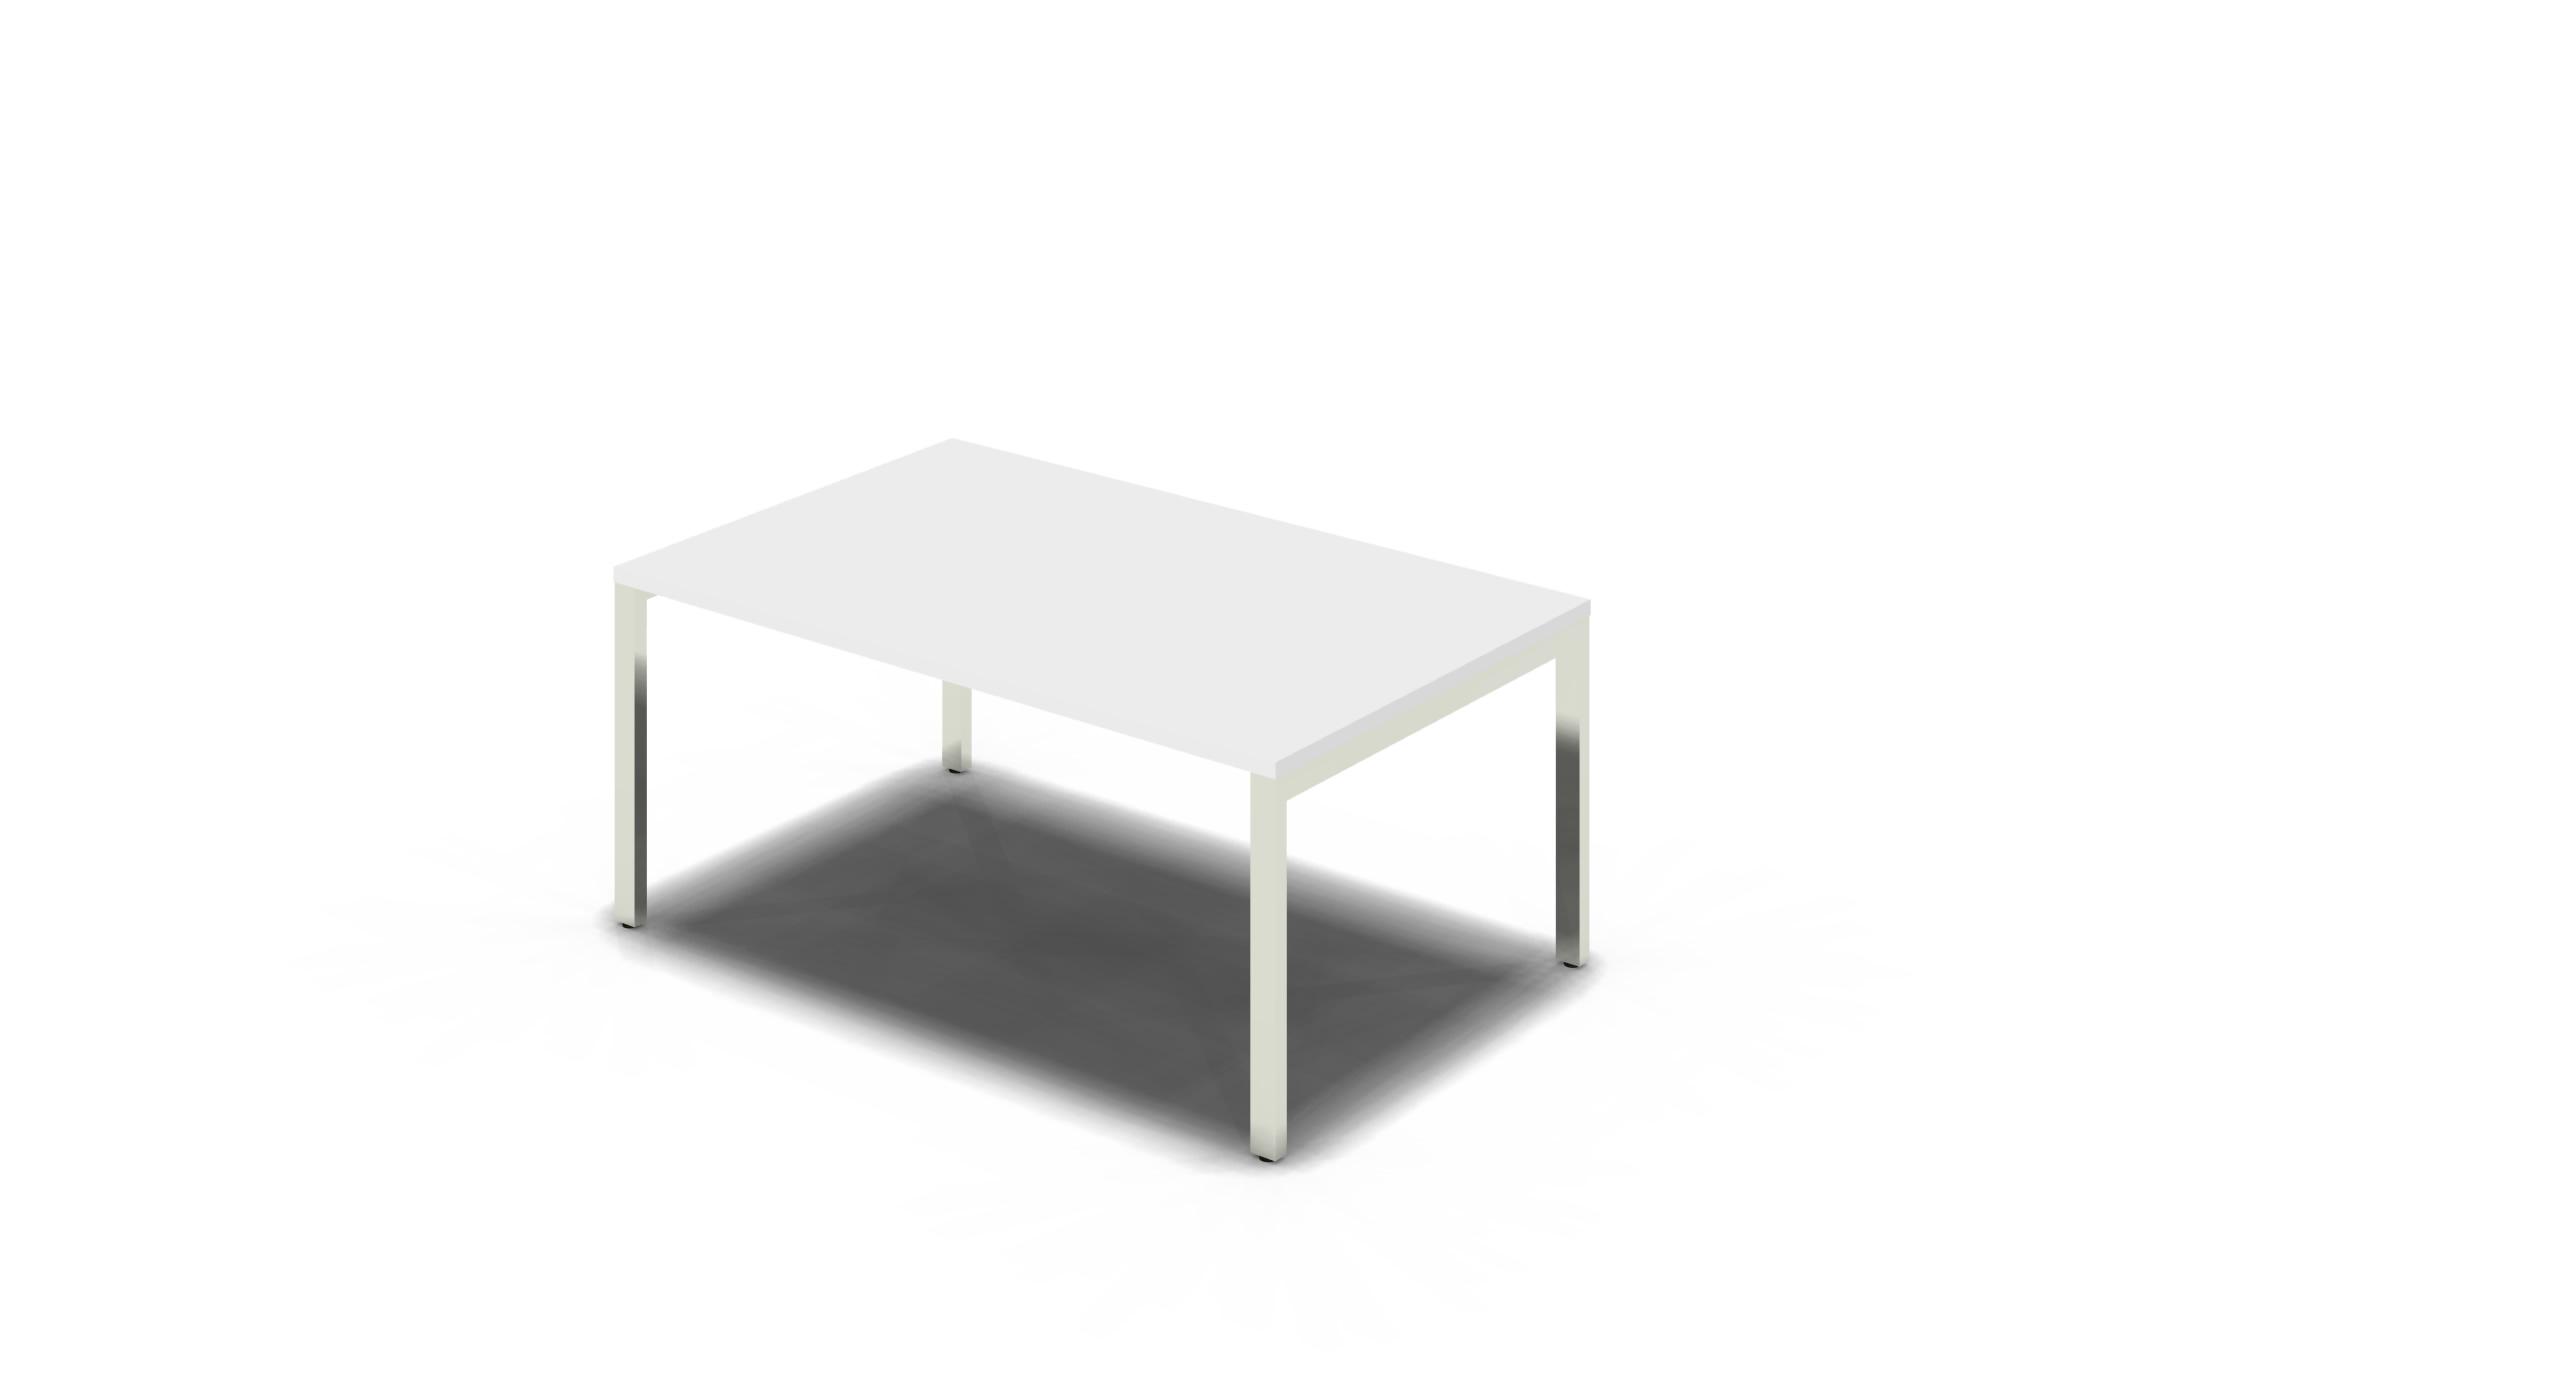 Table_Square_1500x900_Chrome_White_noOption